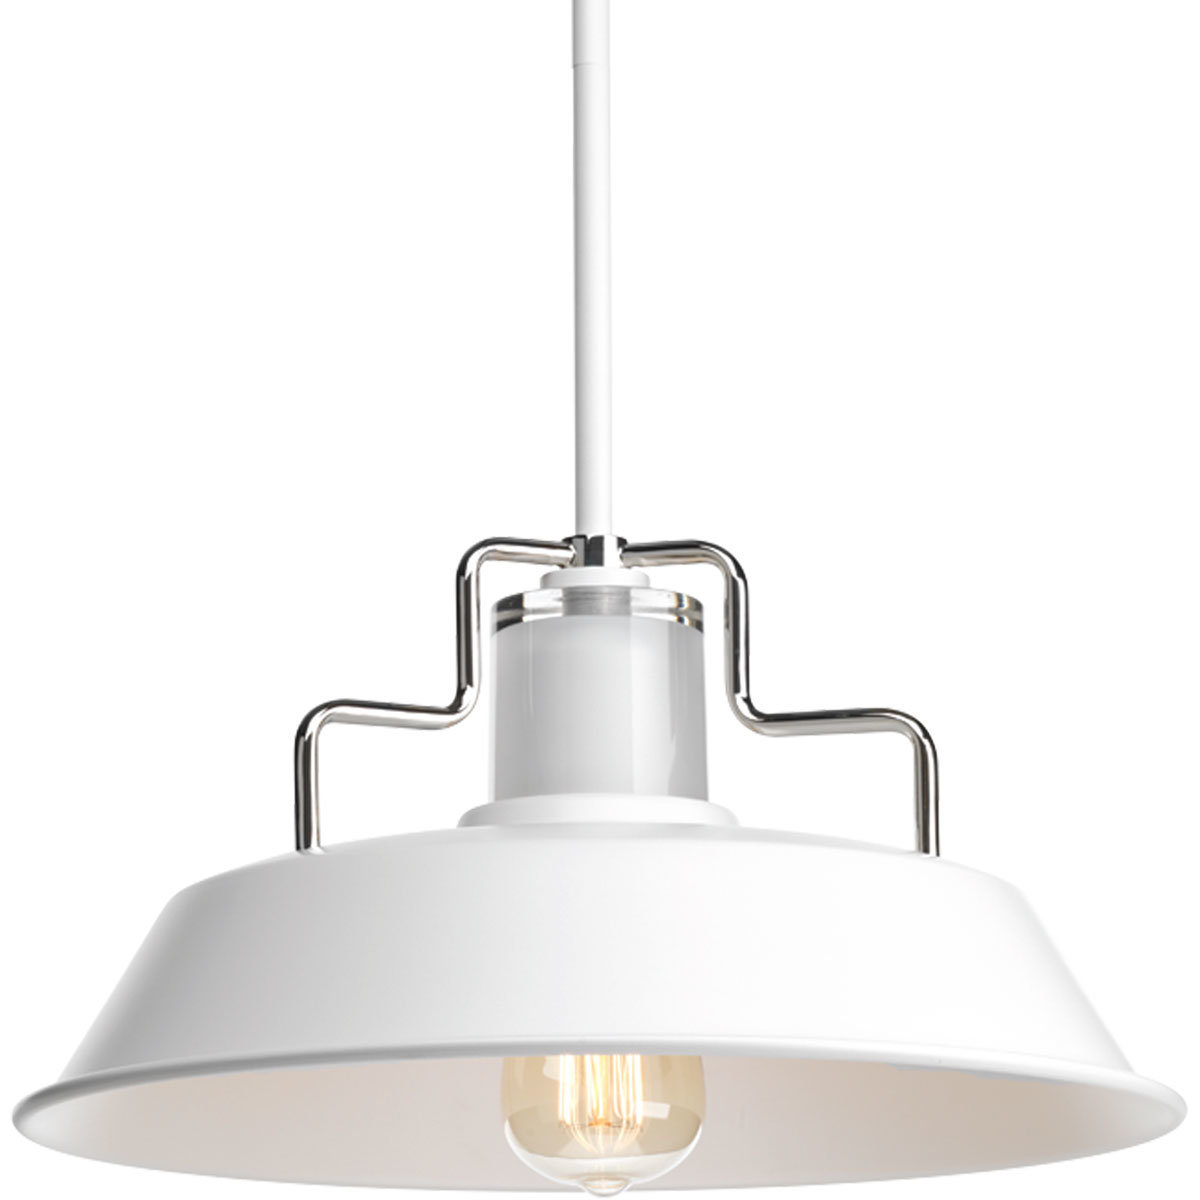 Estevao 1 Light Inverted Pendant With Regard To Gattis 1 Light Dome Pendants (Photo 27 of 30)